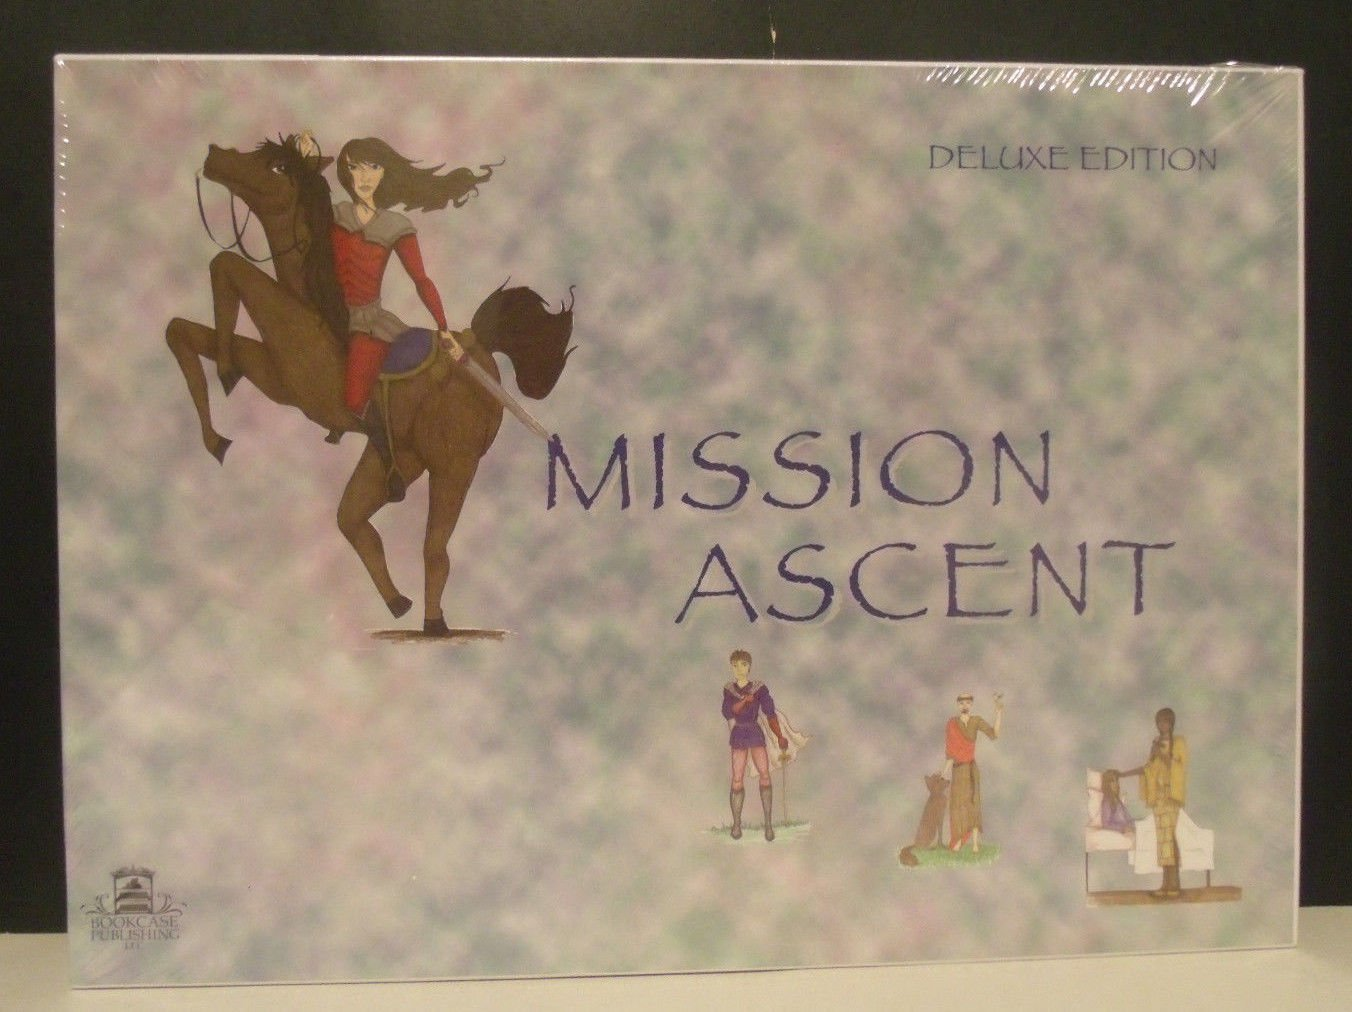 Mission Ascent Catholic Religious Board Game Bookcase Publishing 2001